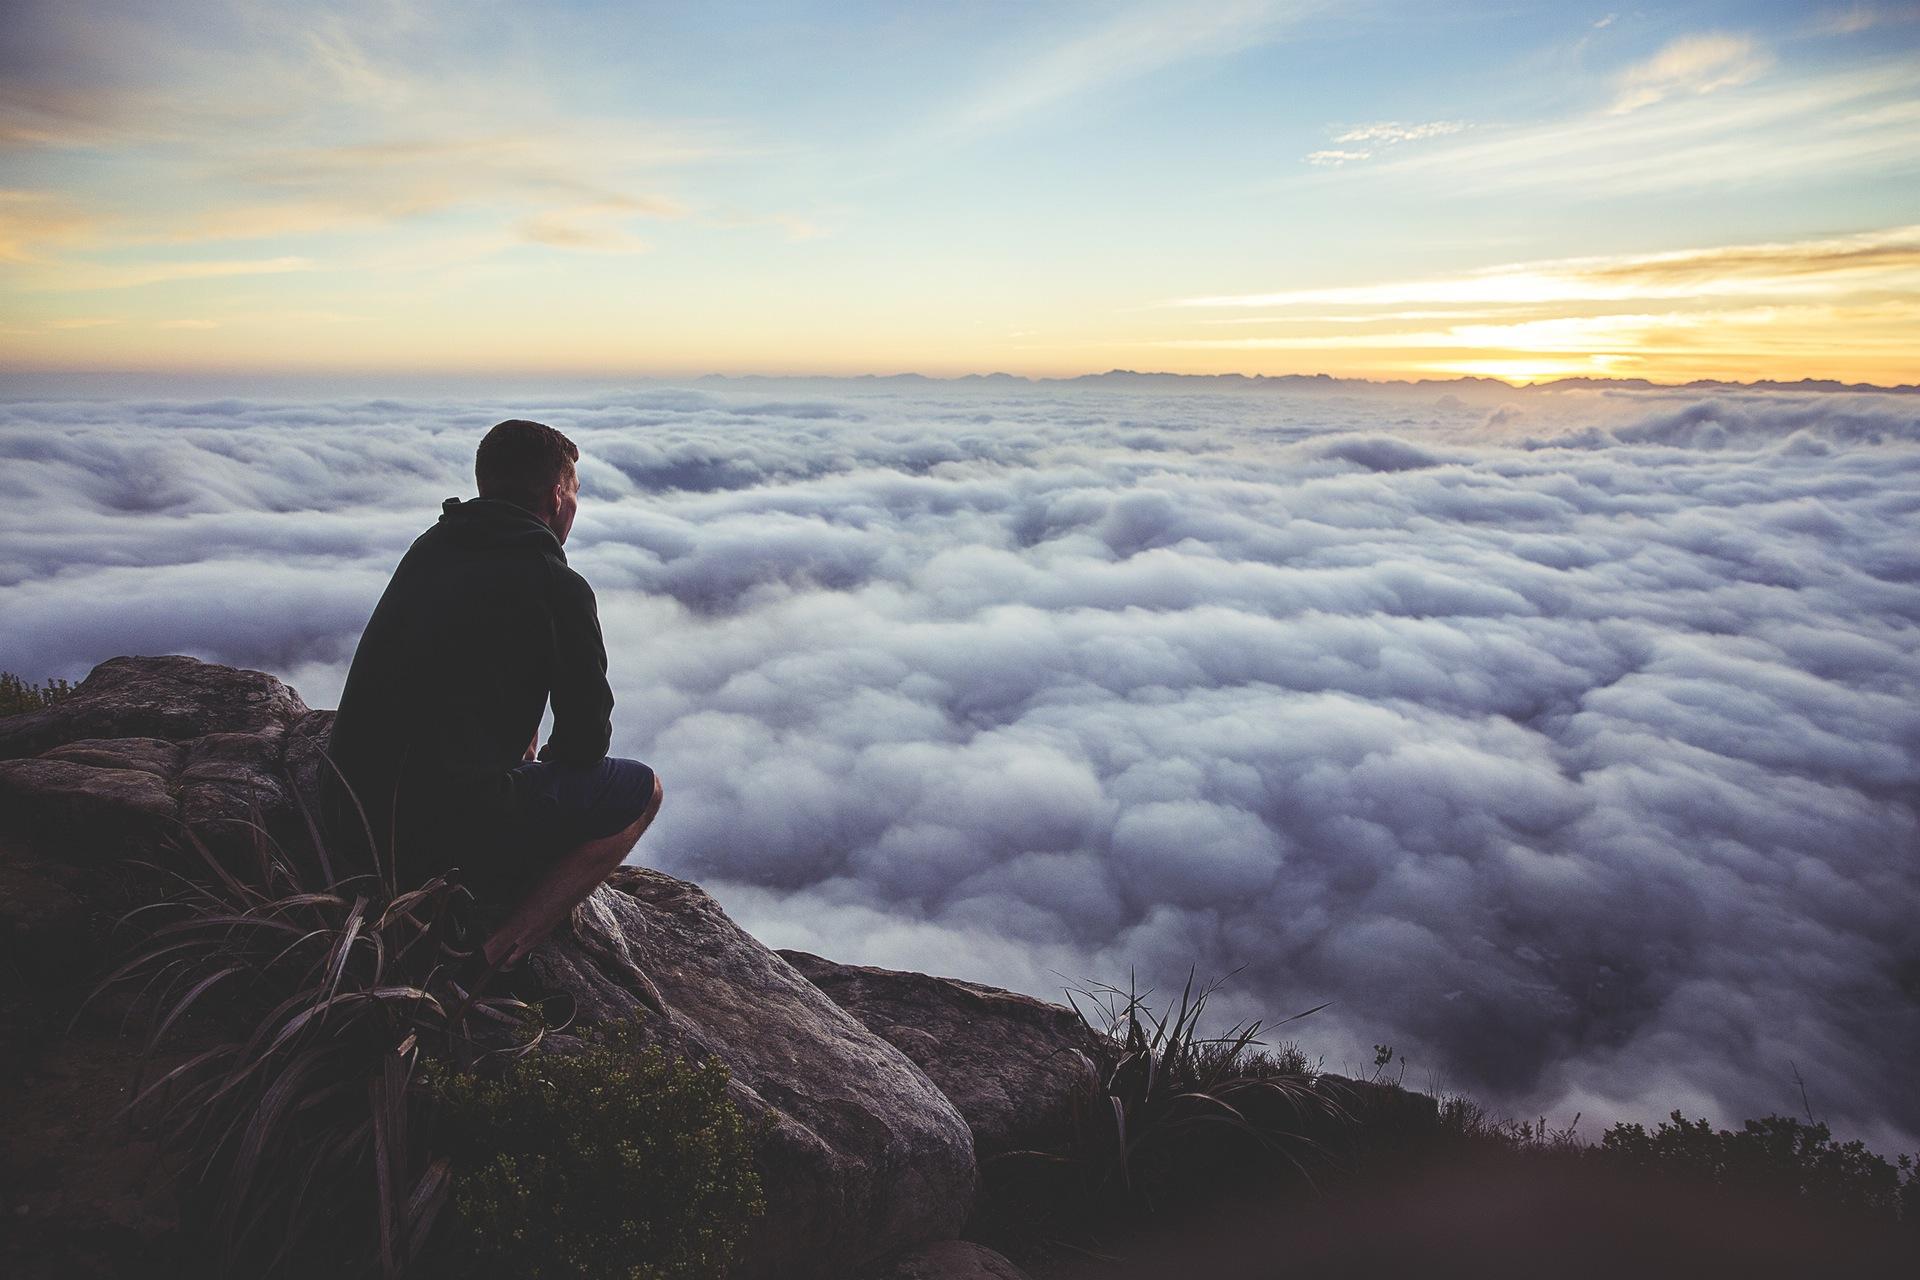 Wolken, Sonne, Sonnenuntergang, Mann, Berge, Nebel, Entspannen Sie sich, Inspiration - Wallpaper HD - Prof.-falken.com